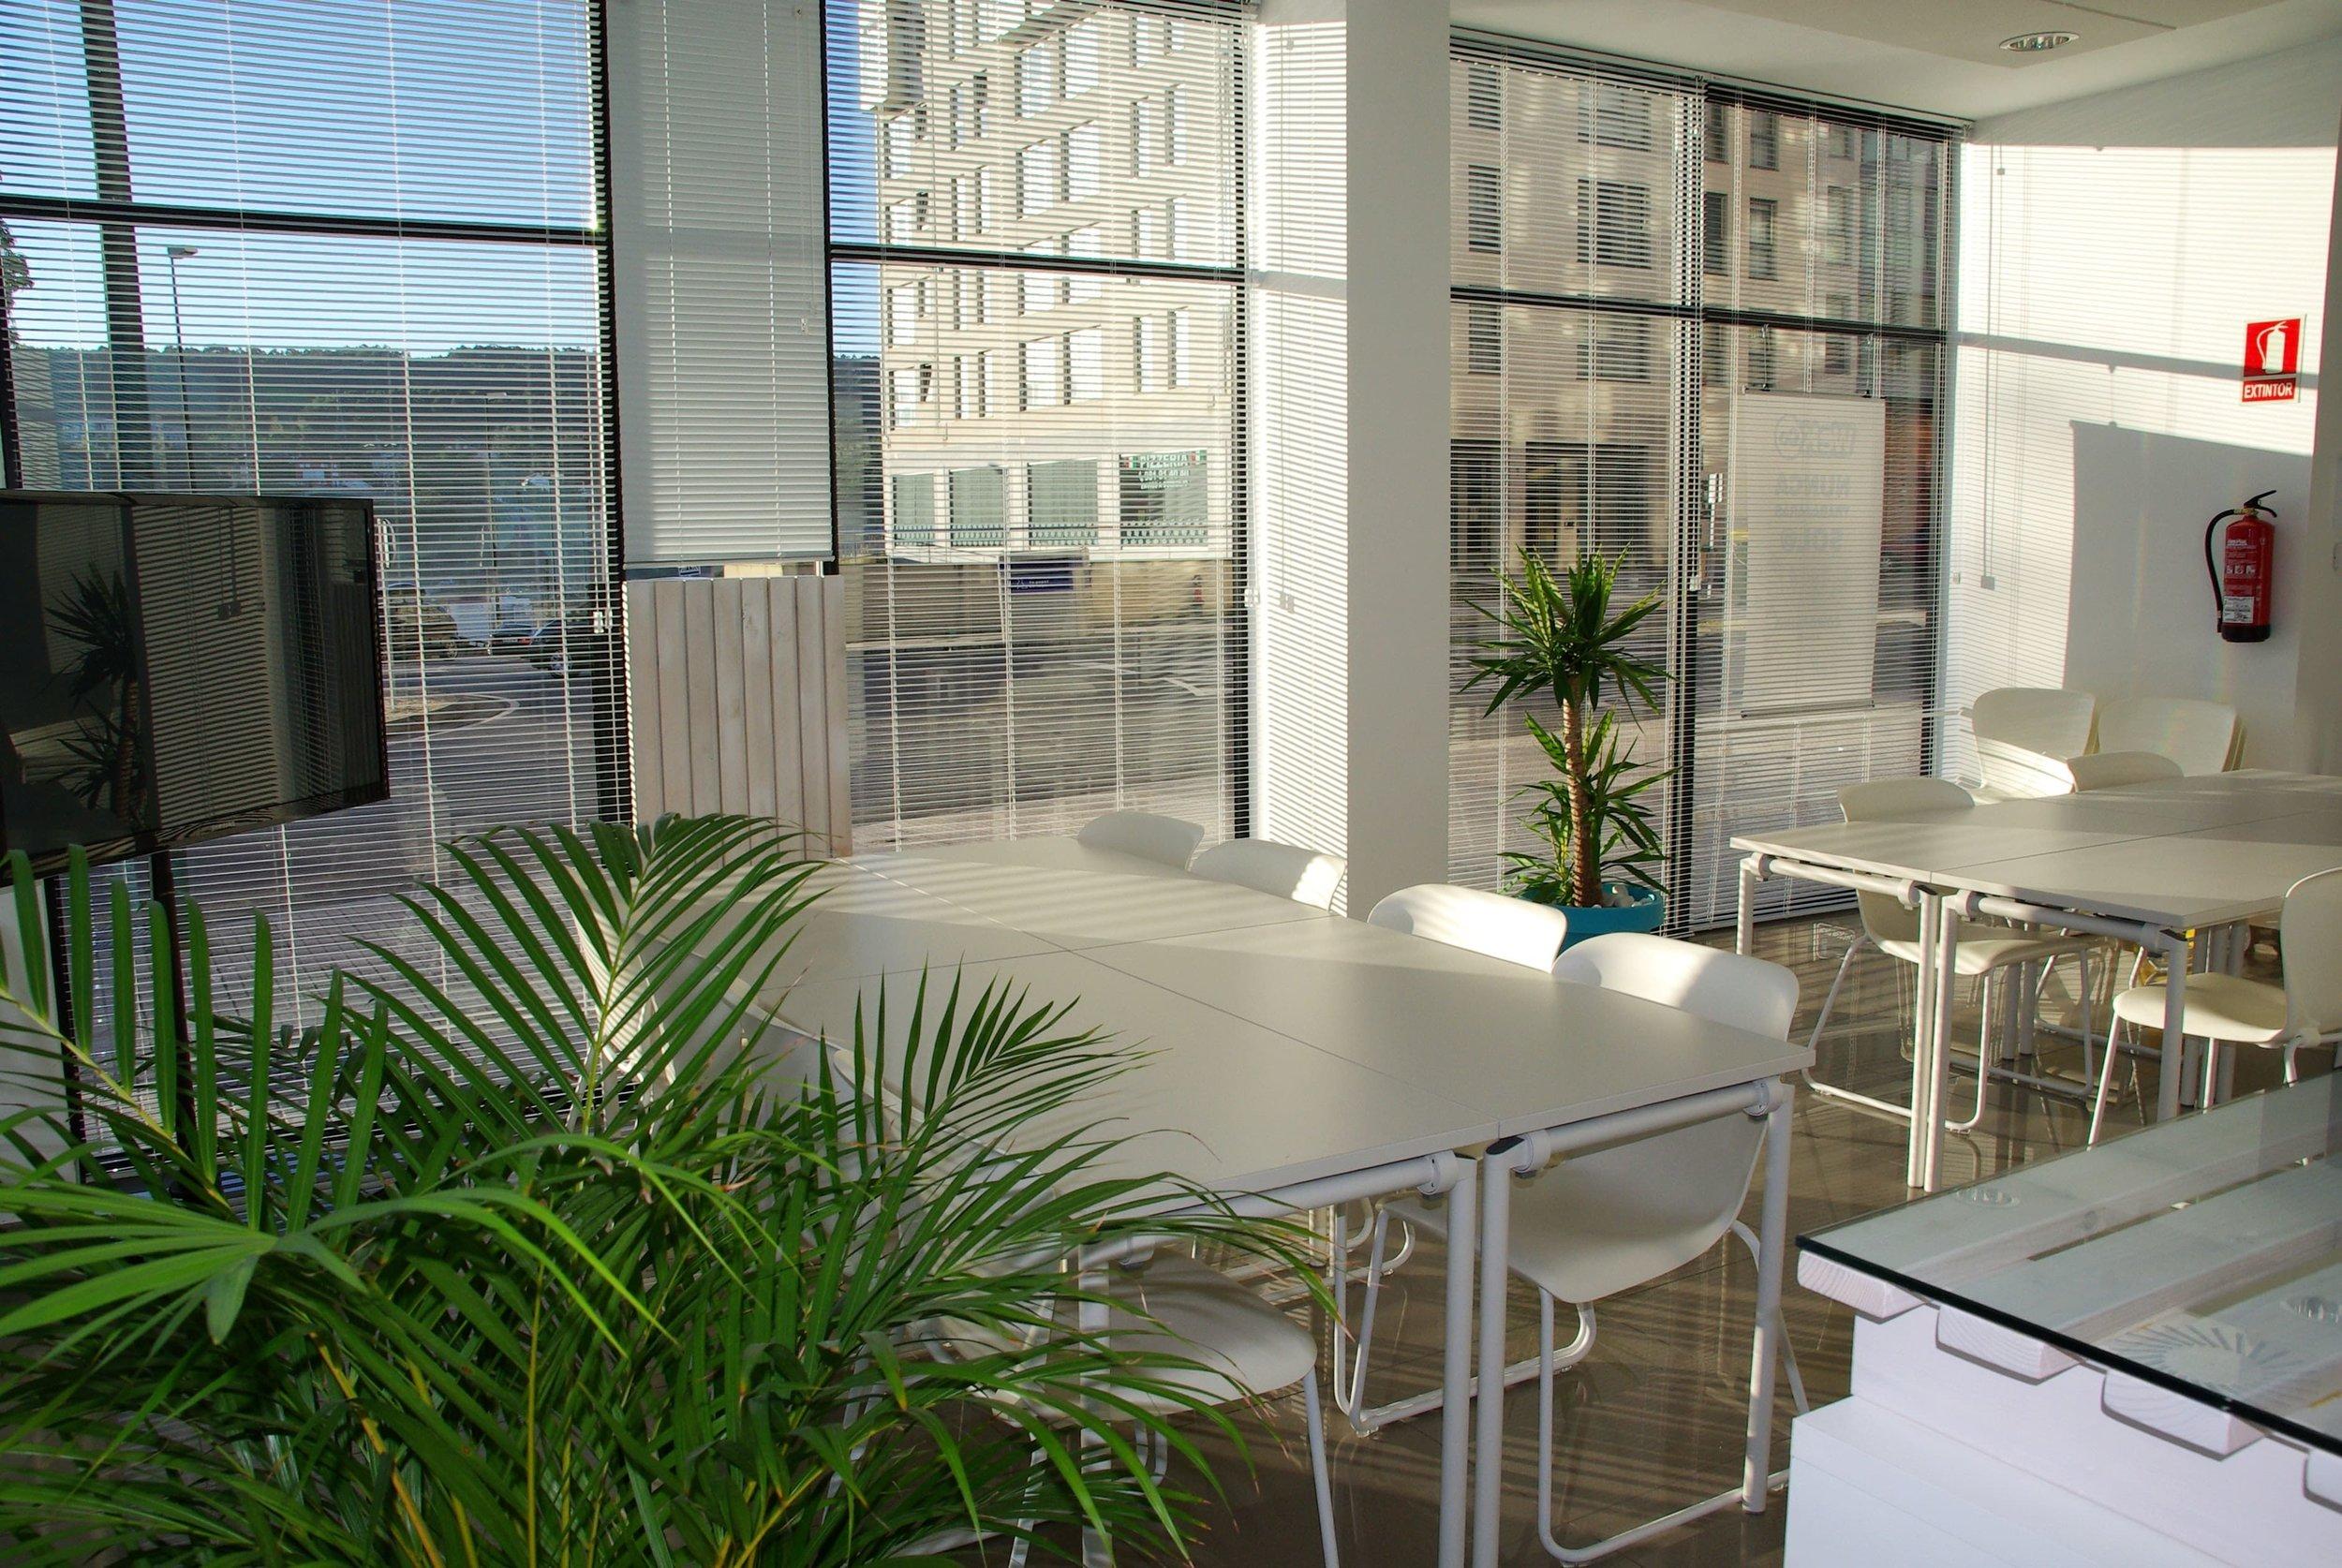 apartment-architecture-business-221537-min.jpg